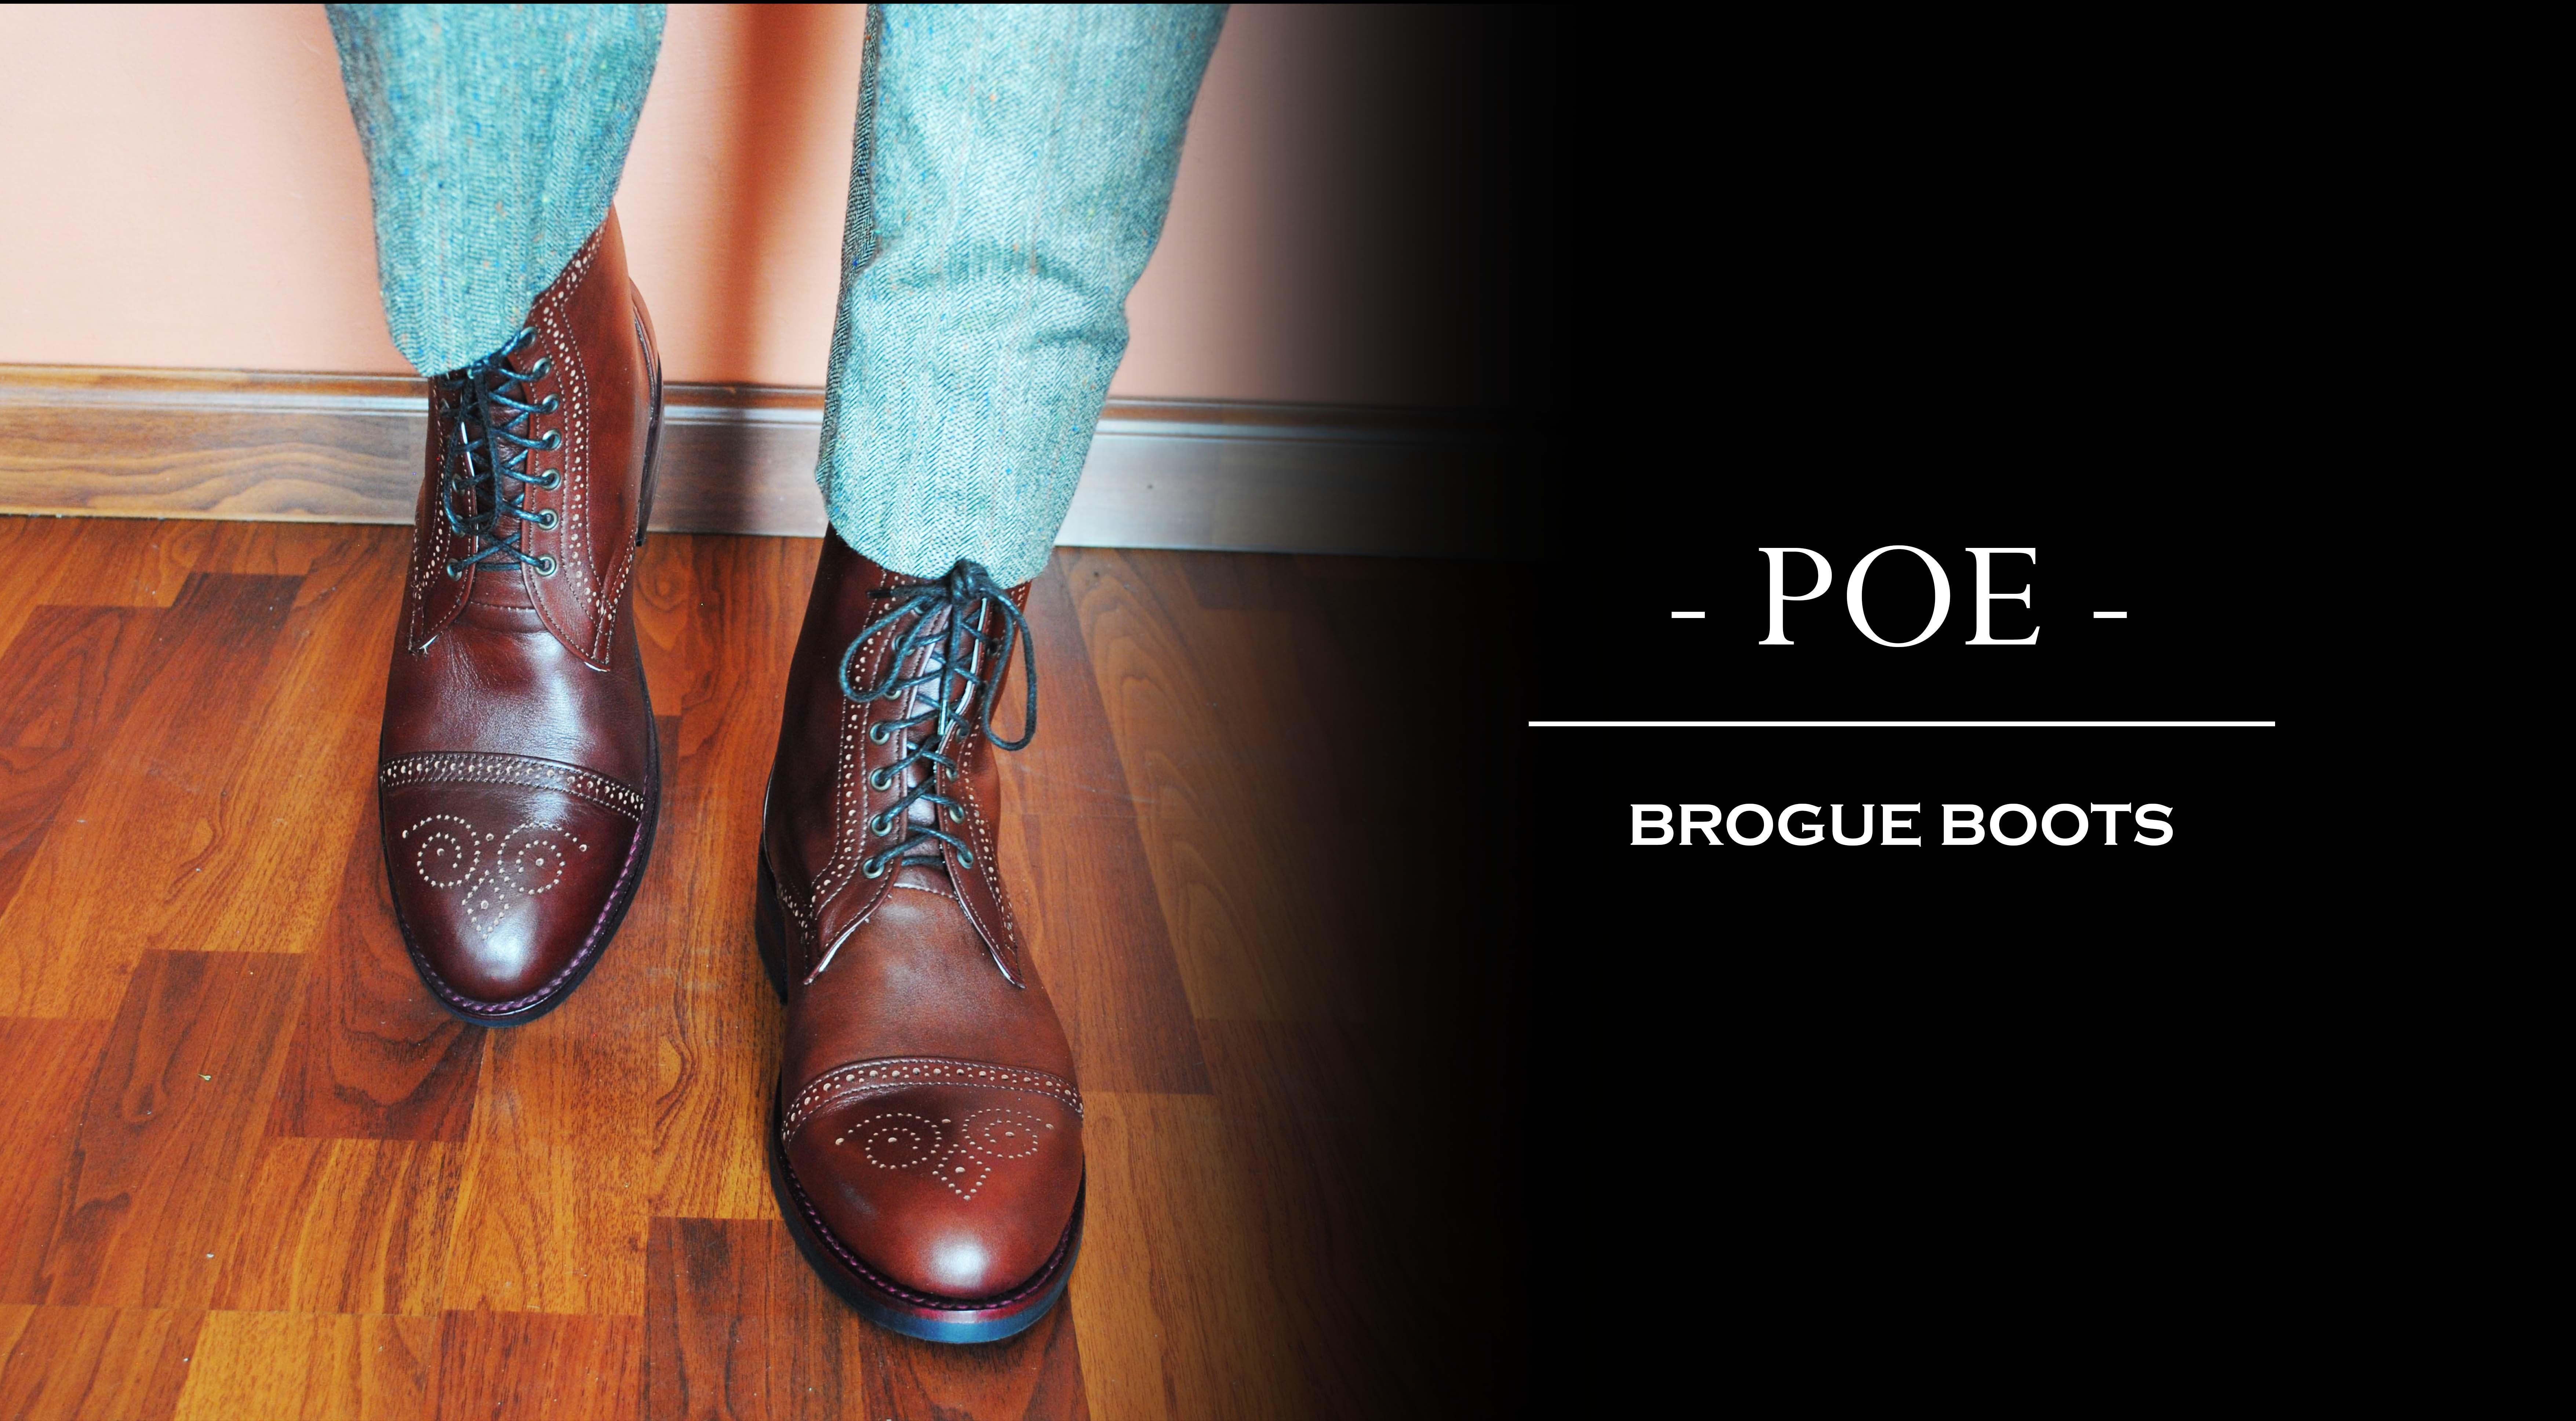 Poe Brogue boots